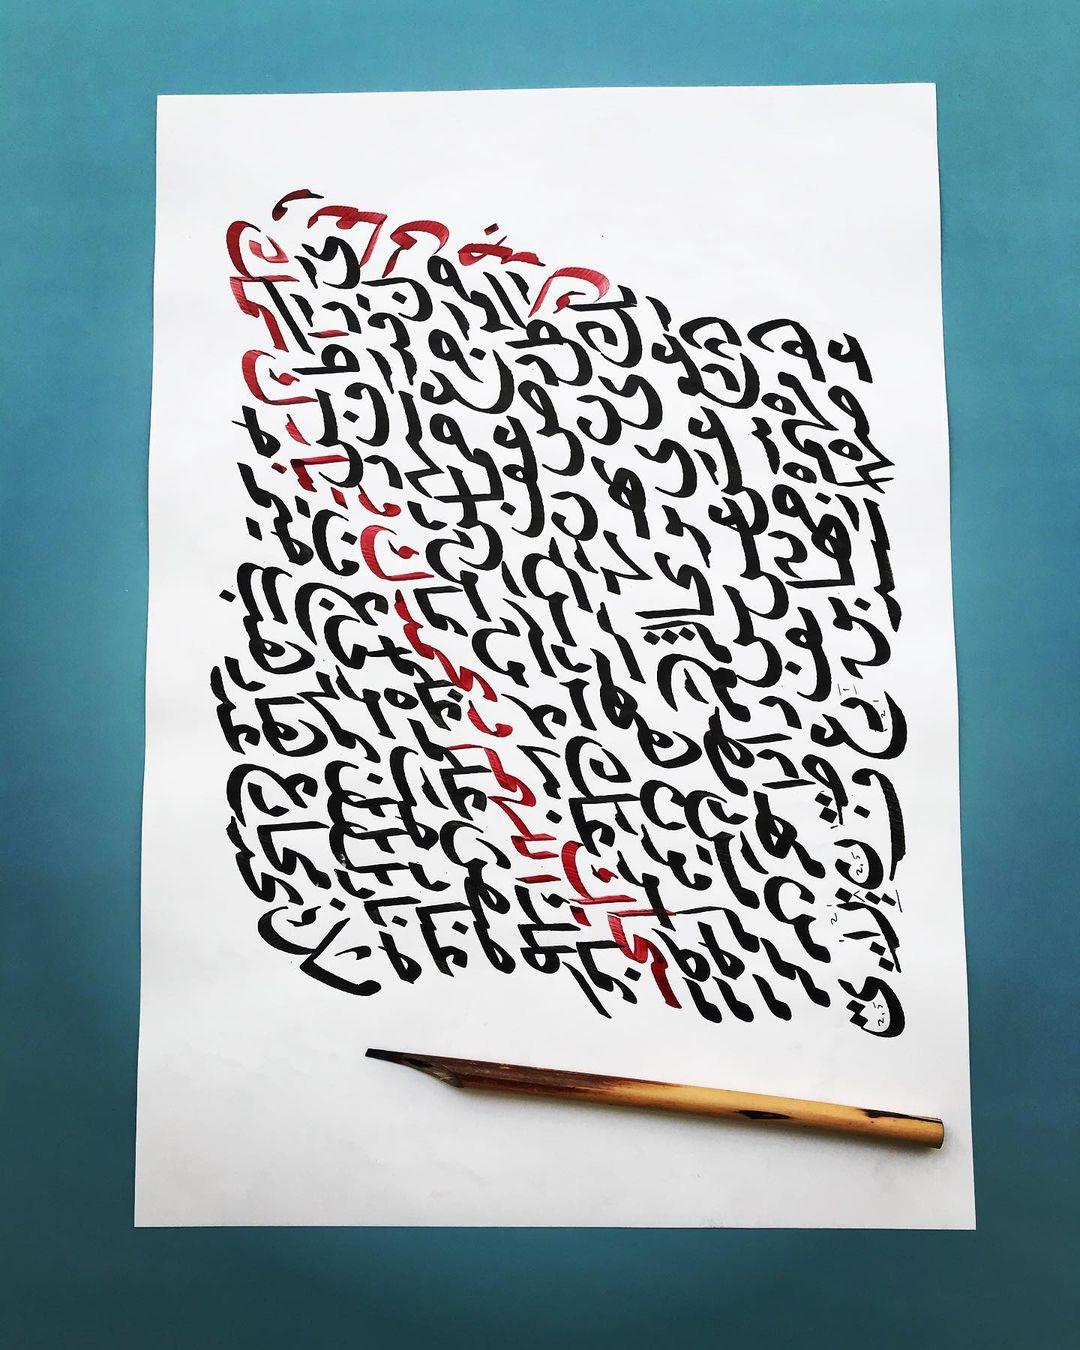 Donwload Photo Mashq #mashq #مشق #exercise #arabiccalligraphy #islamiccalligraphy #tezhip #hüs...- hattat_aa 3